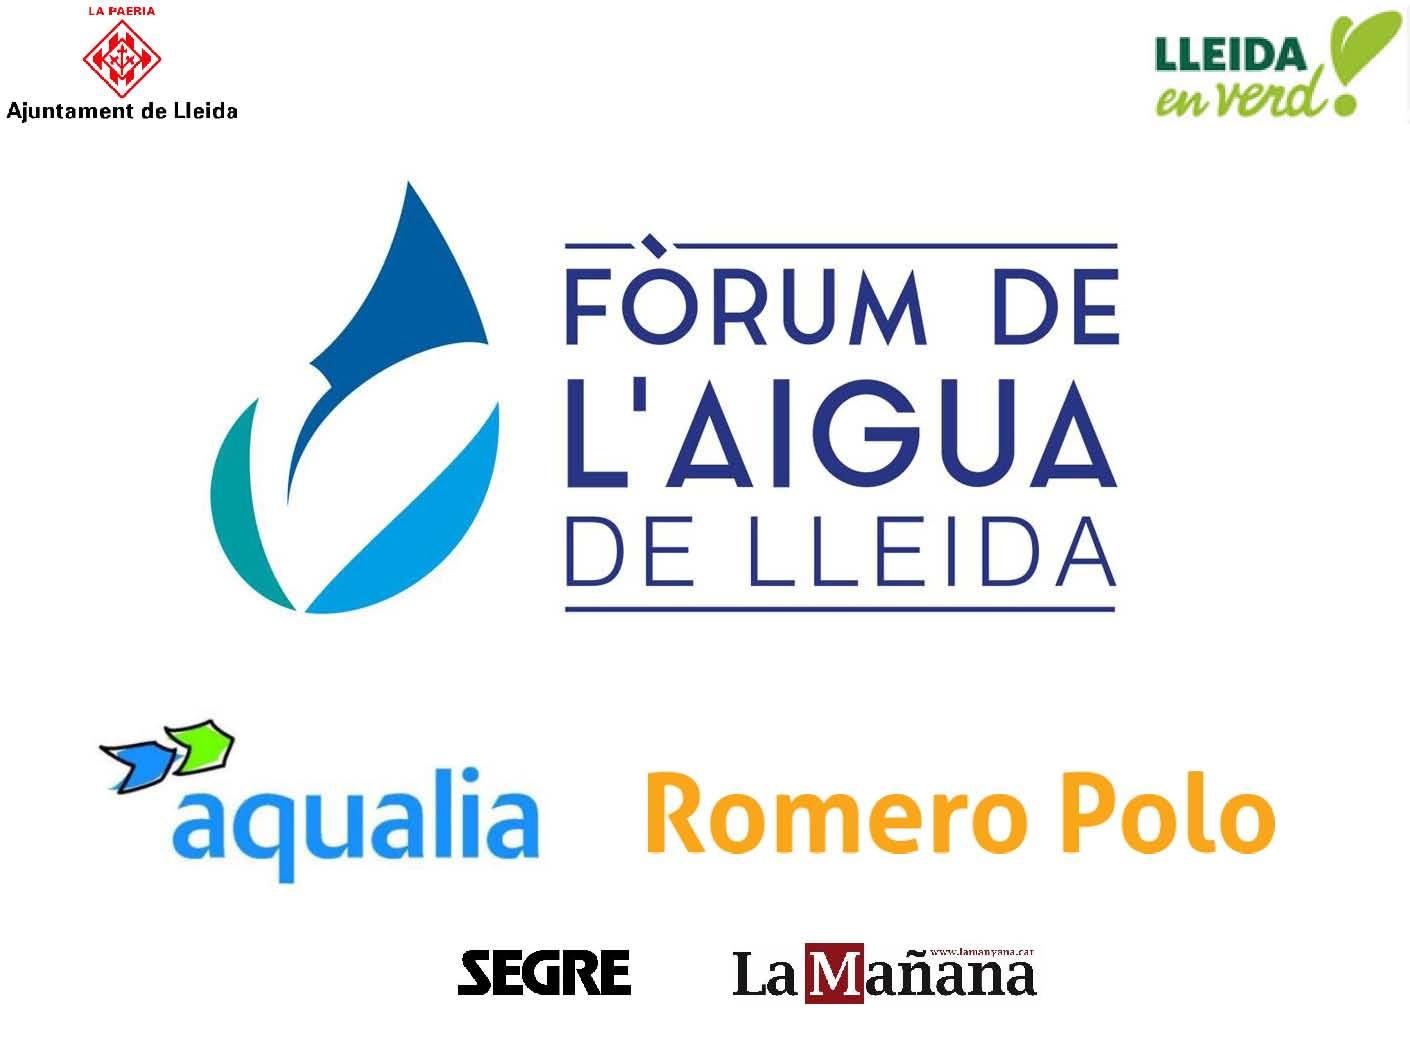 Presentacio_logos_ForumdelAigua_Pgina_1.jpg